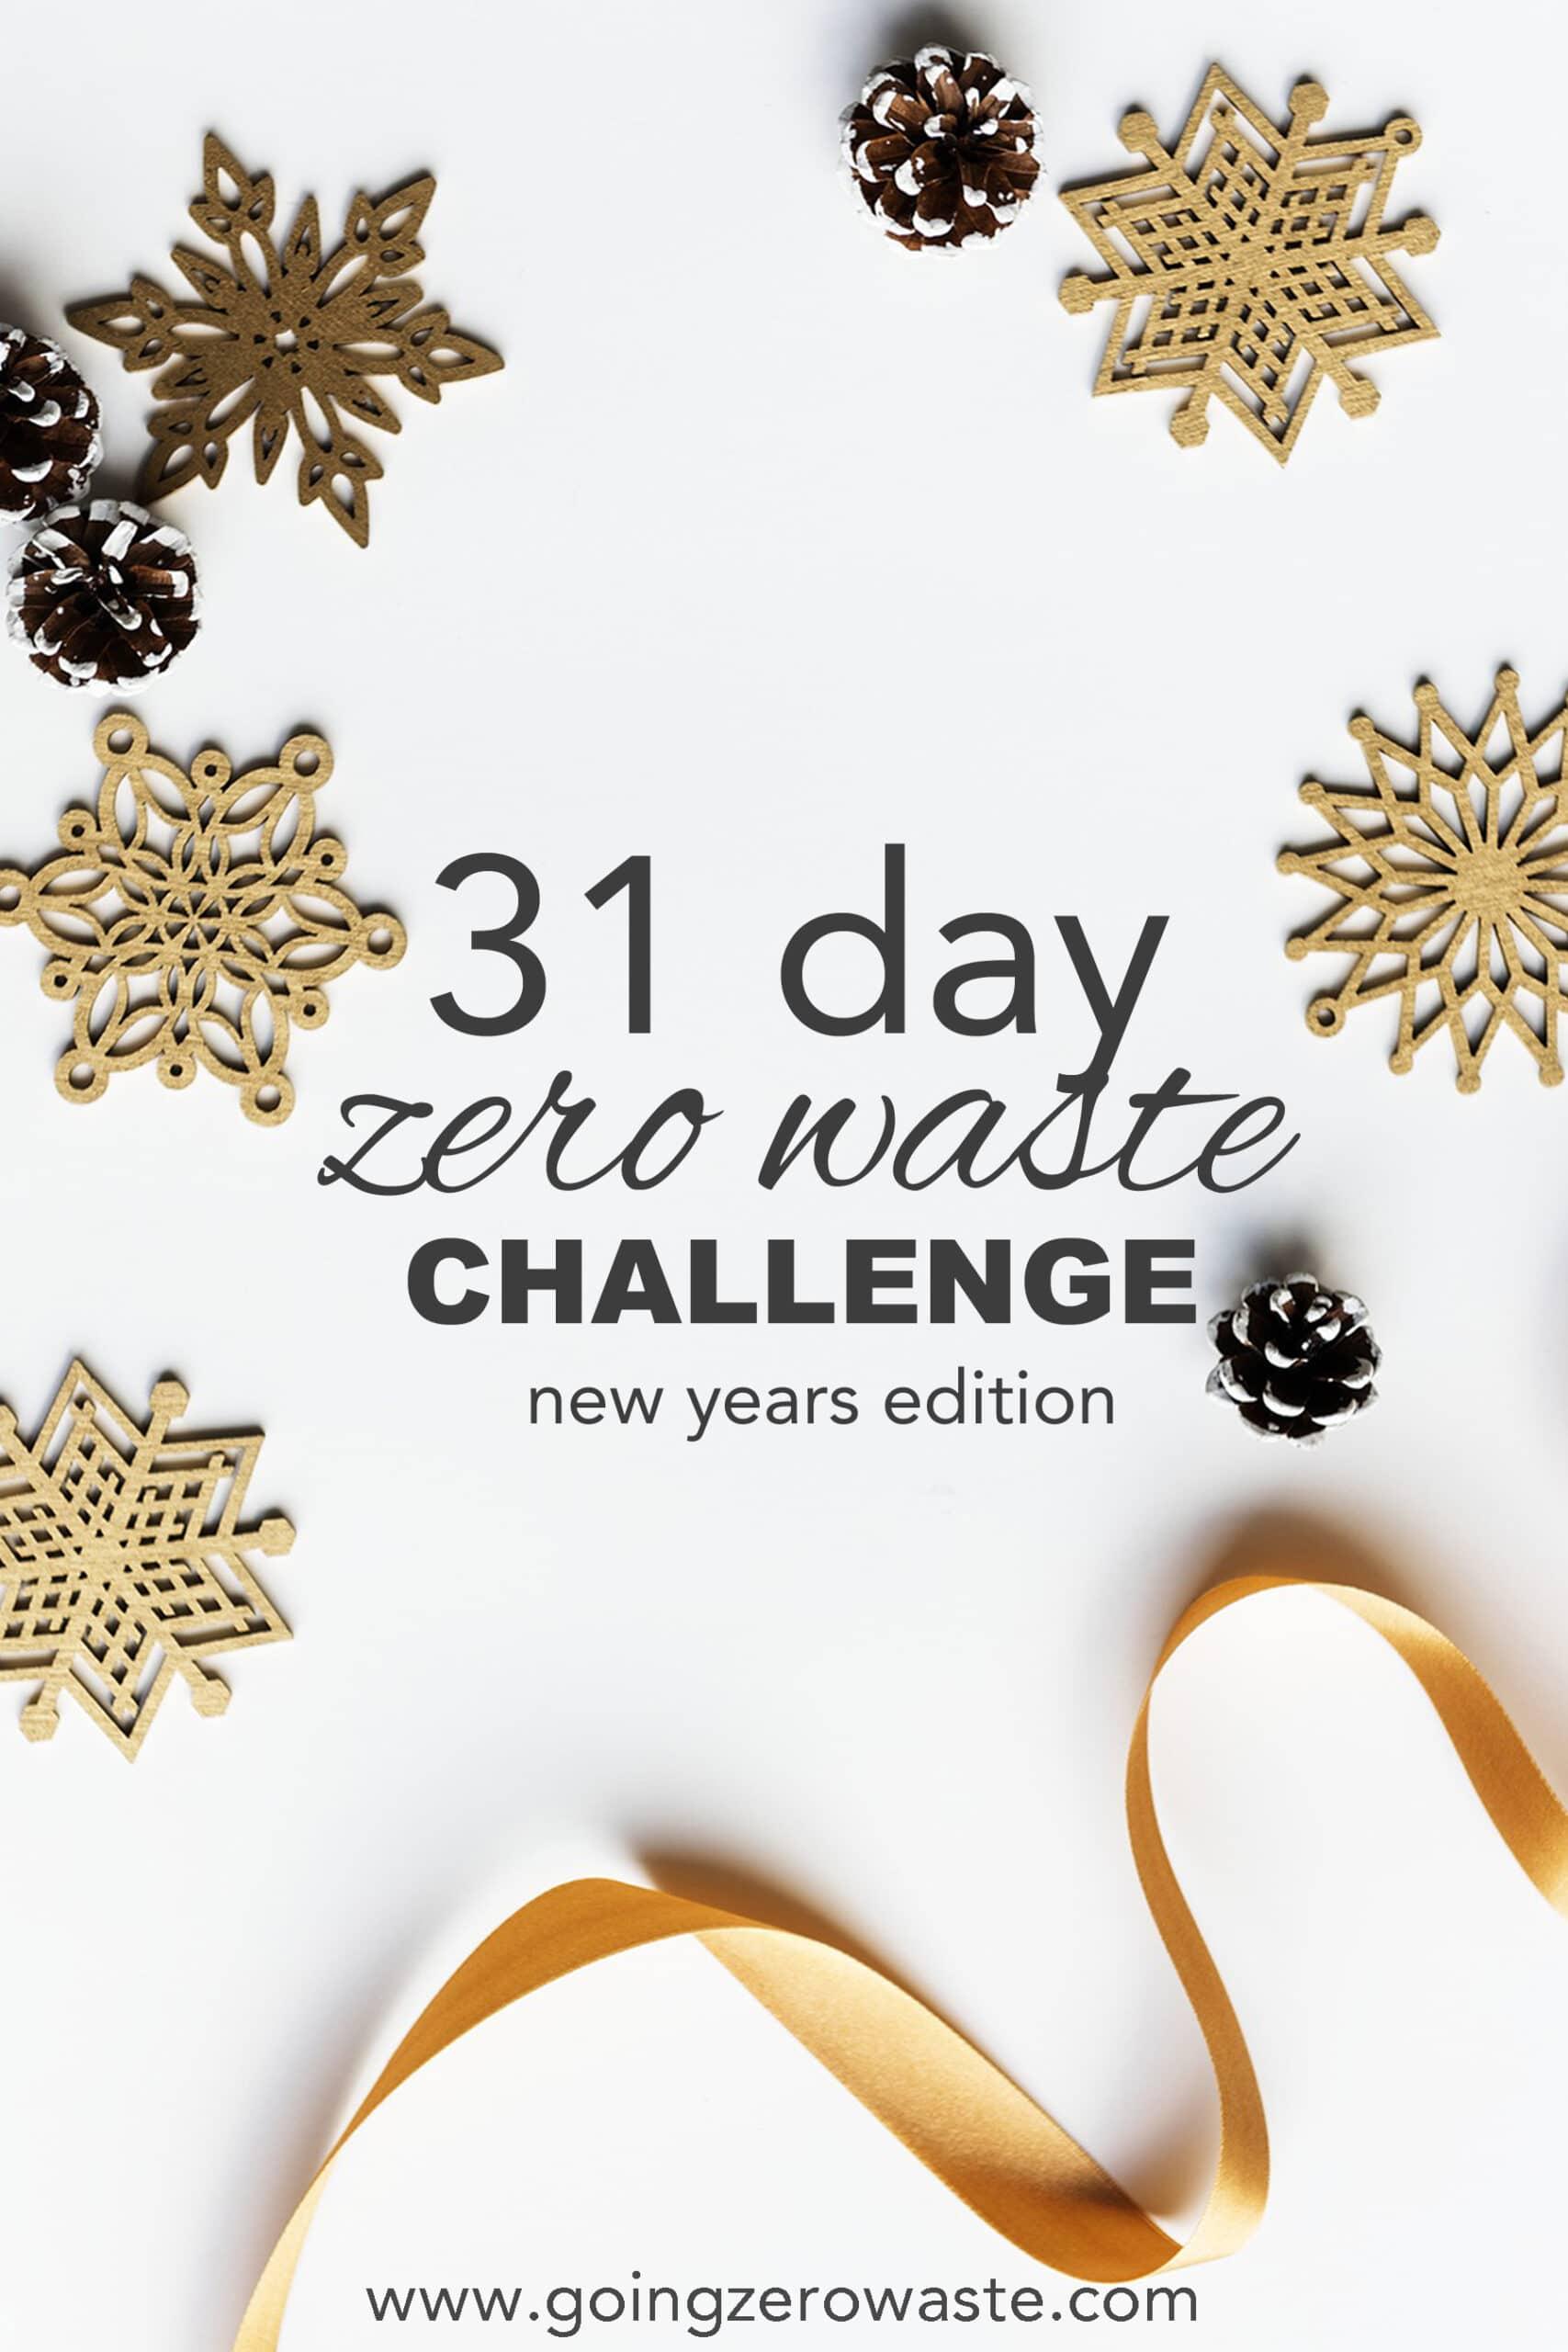 31 Day Zero Waste Challenge New Years Edition